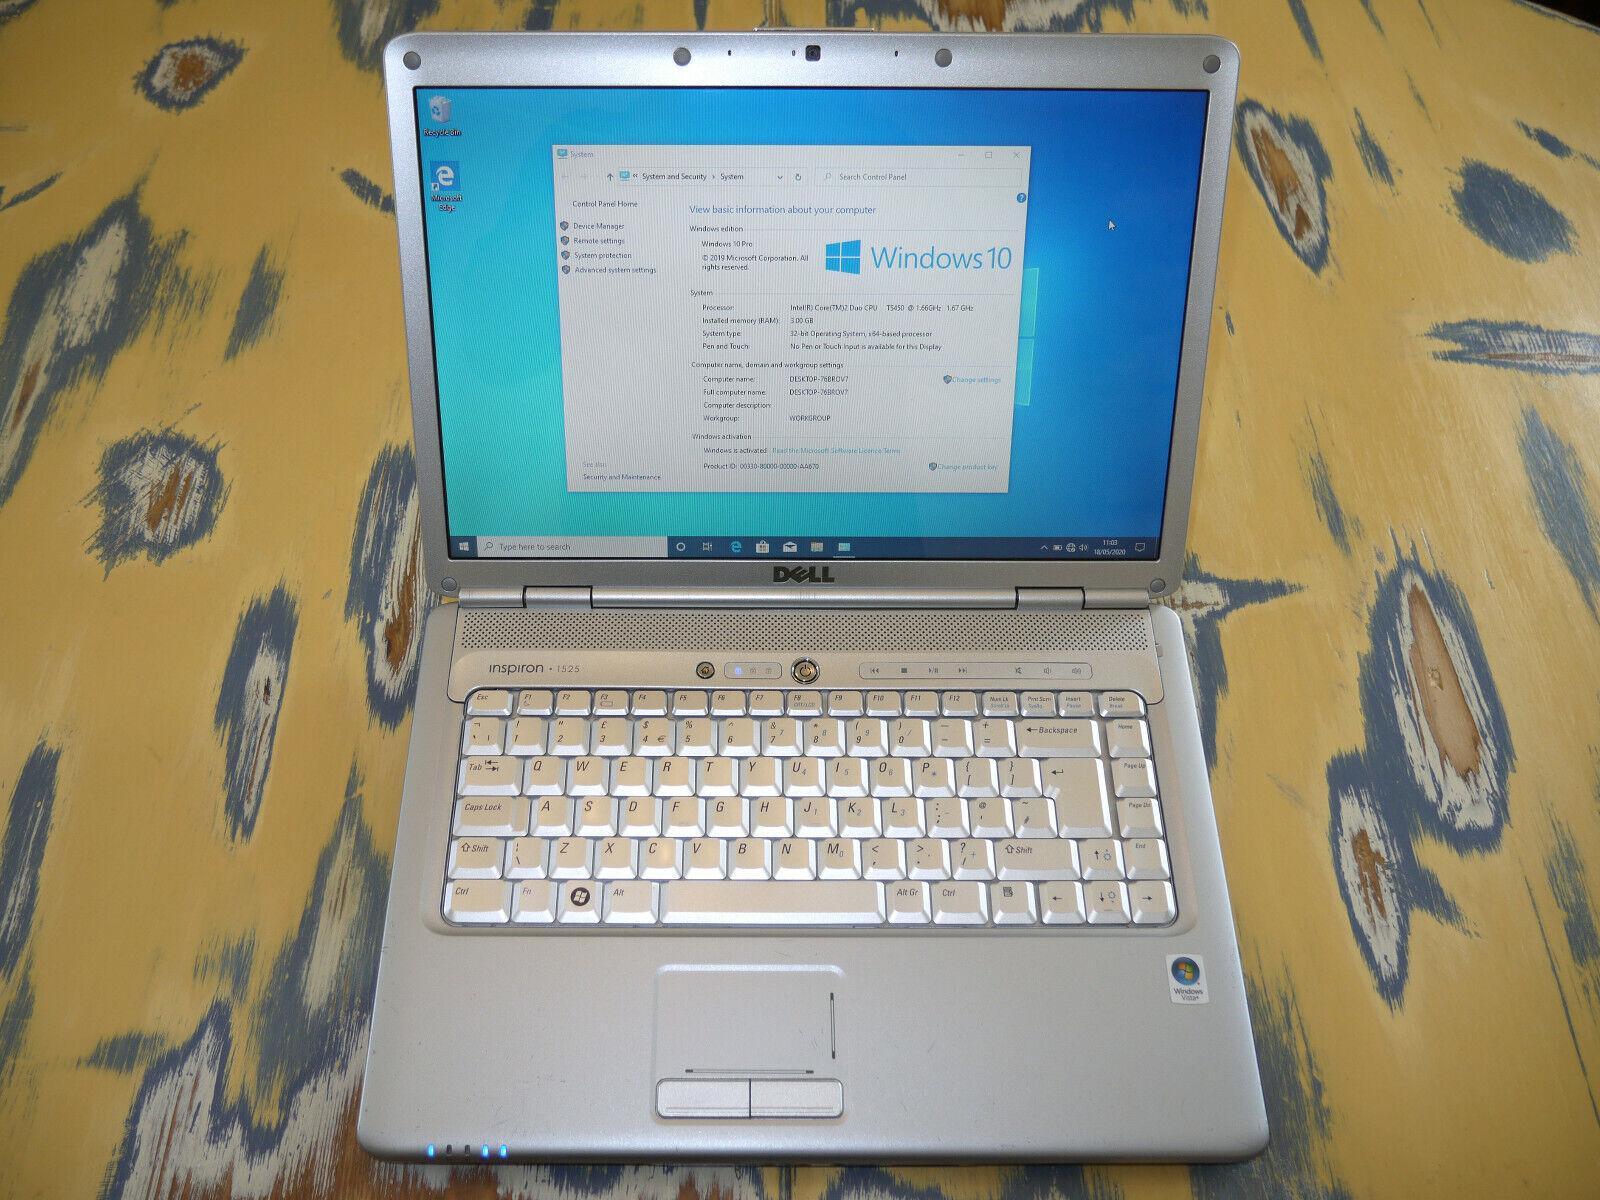 "Laptop Windows - Dell Inspiron 1525 Laptop 15.4"" Core 2 Duo 1.66 GHz 3GB RAM 240GB HDD Windows 10"